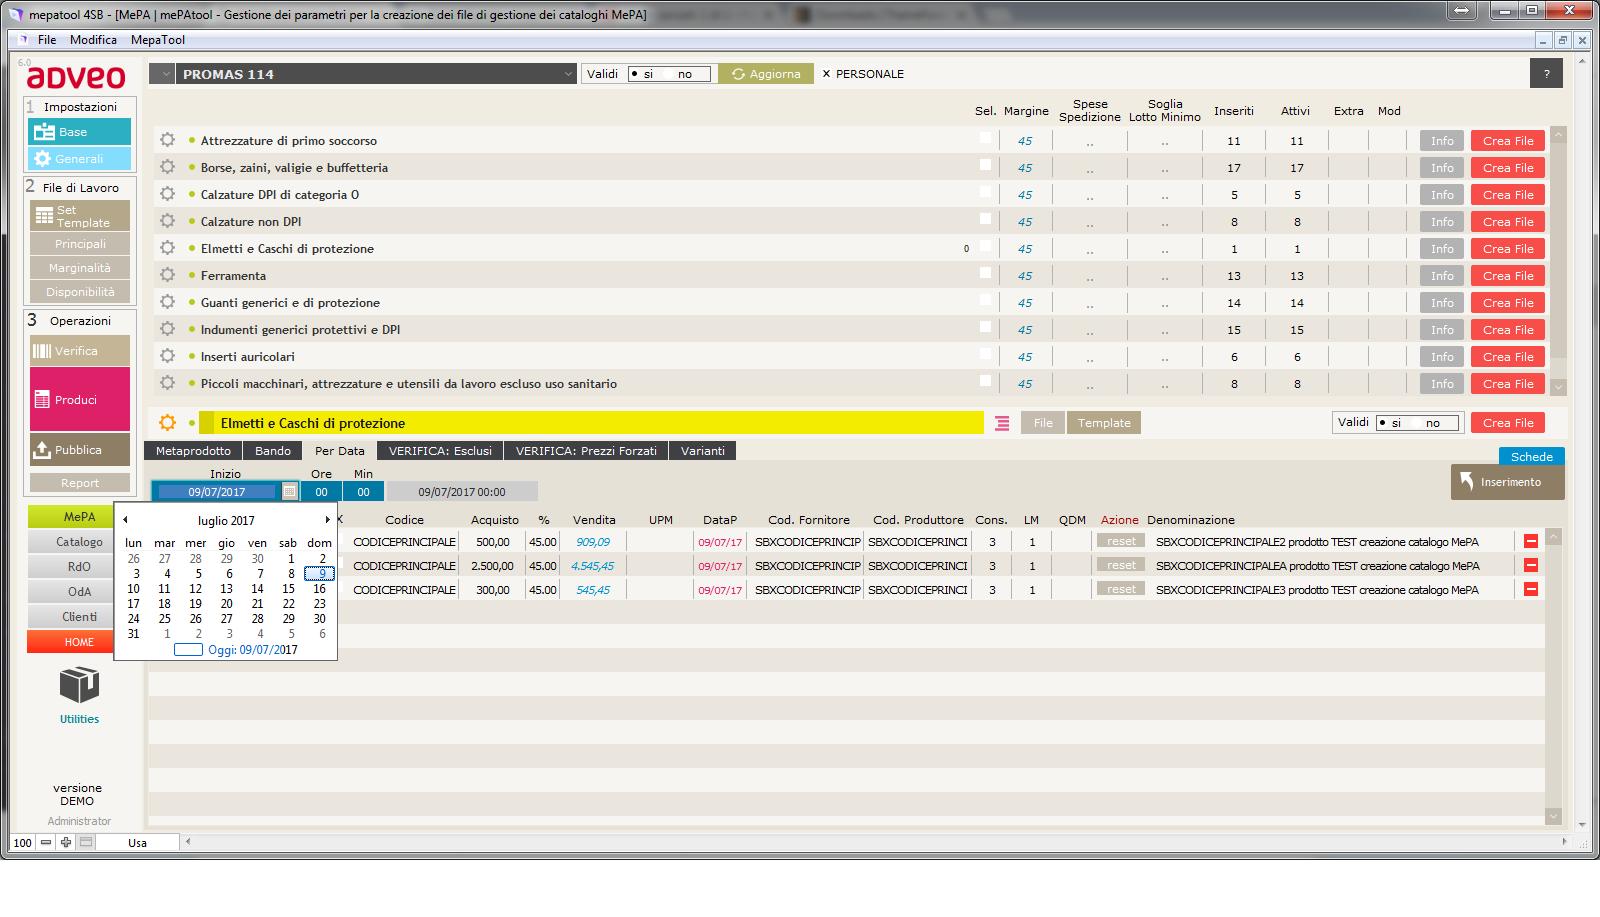 catalogo_mepa_data